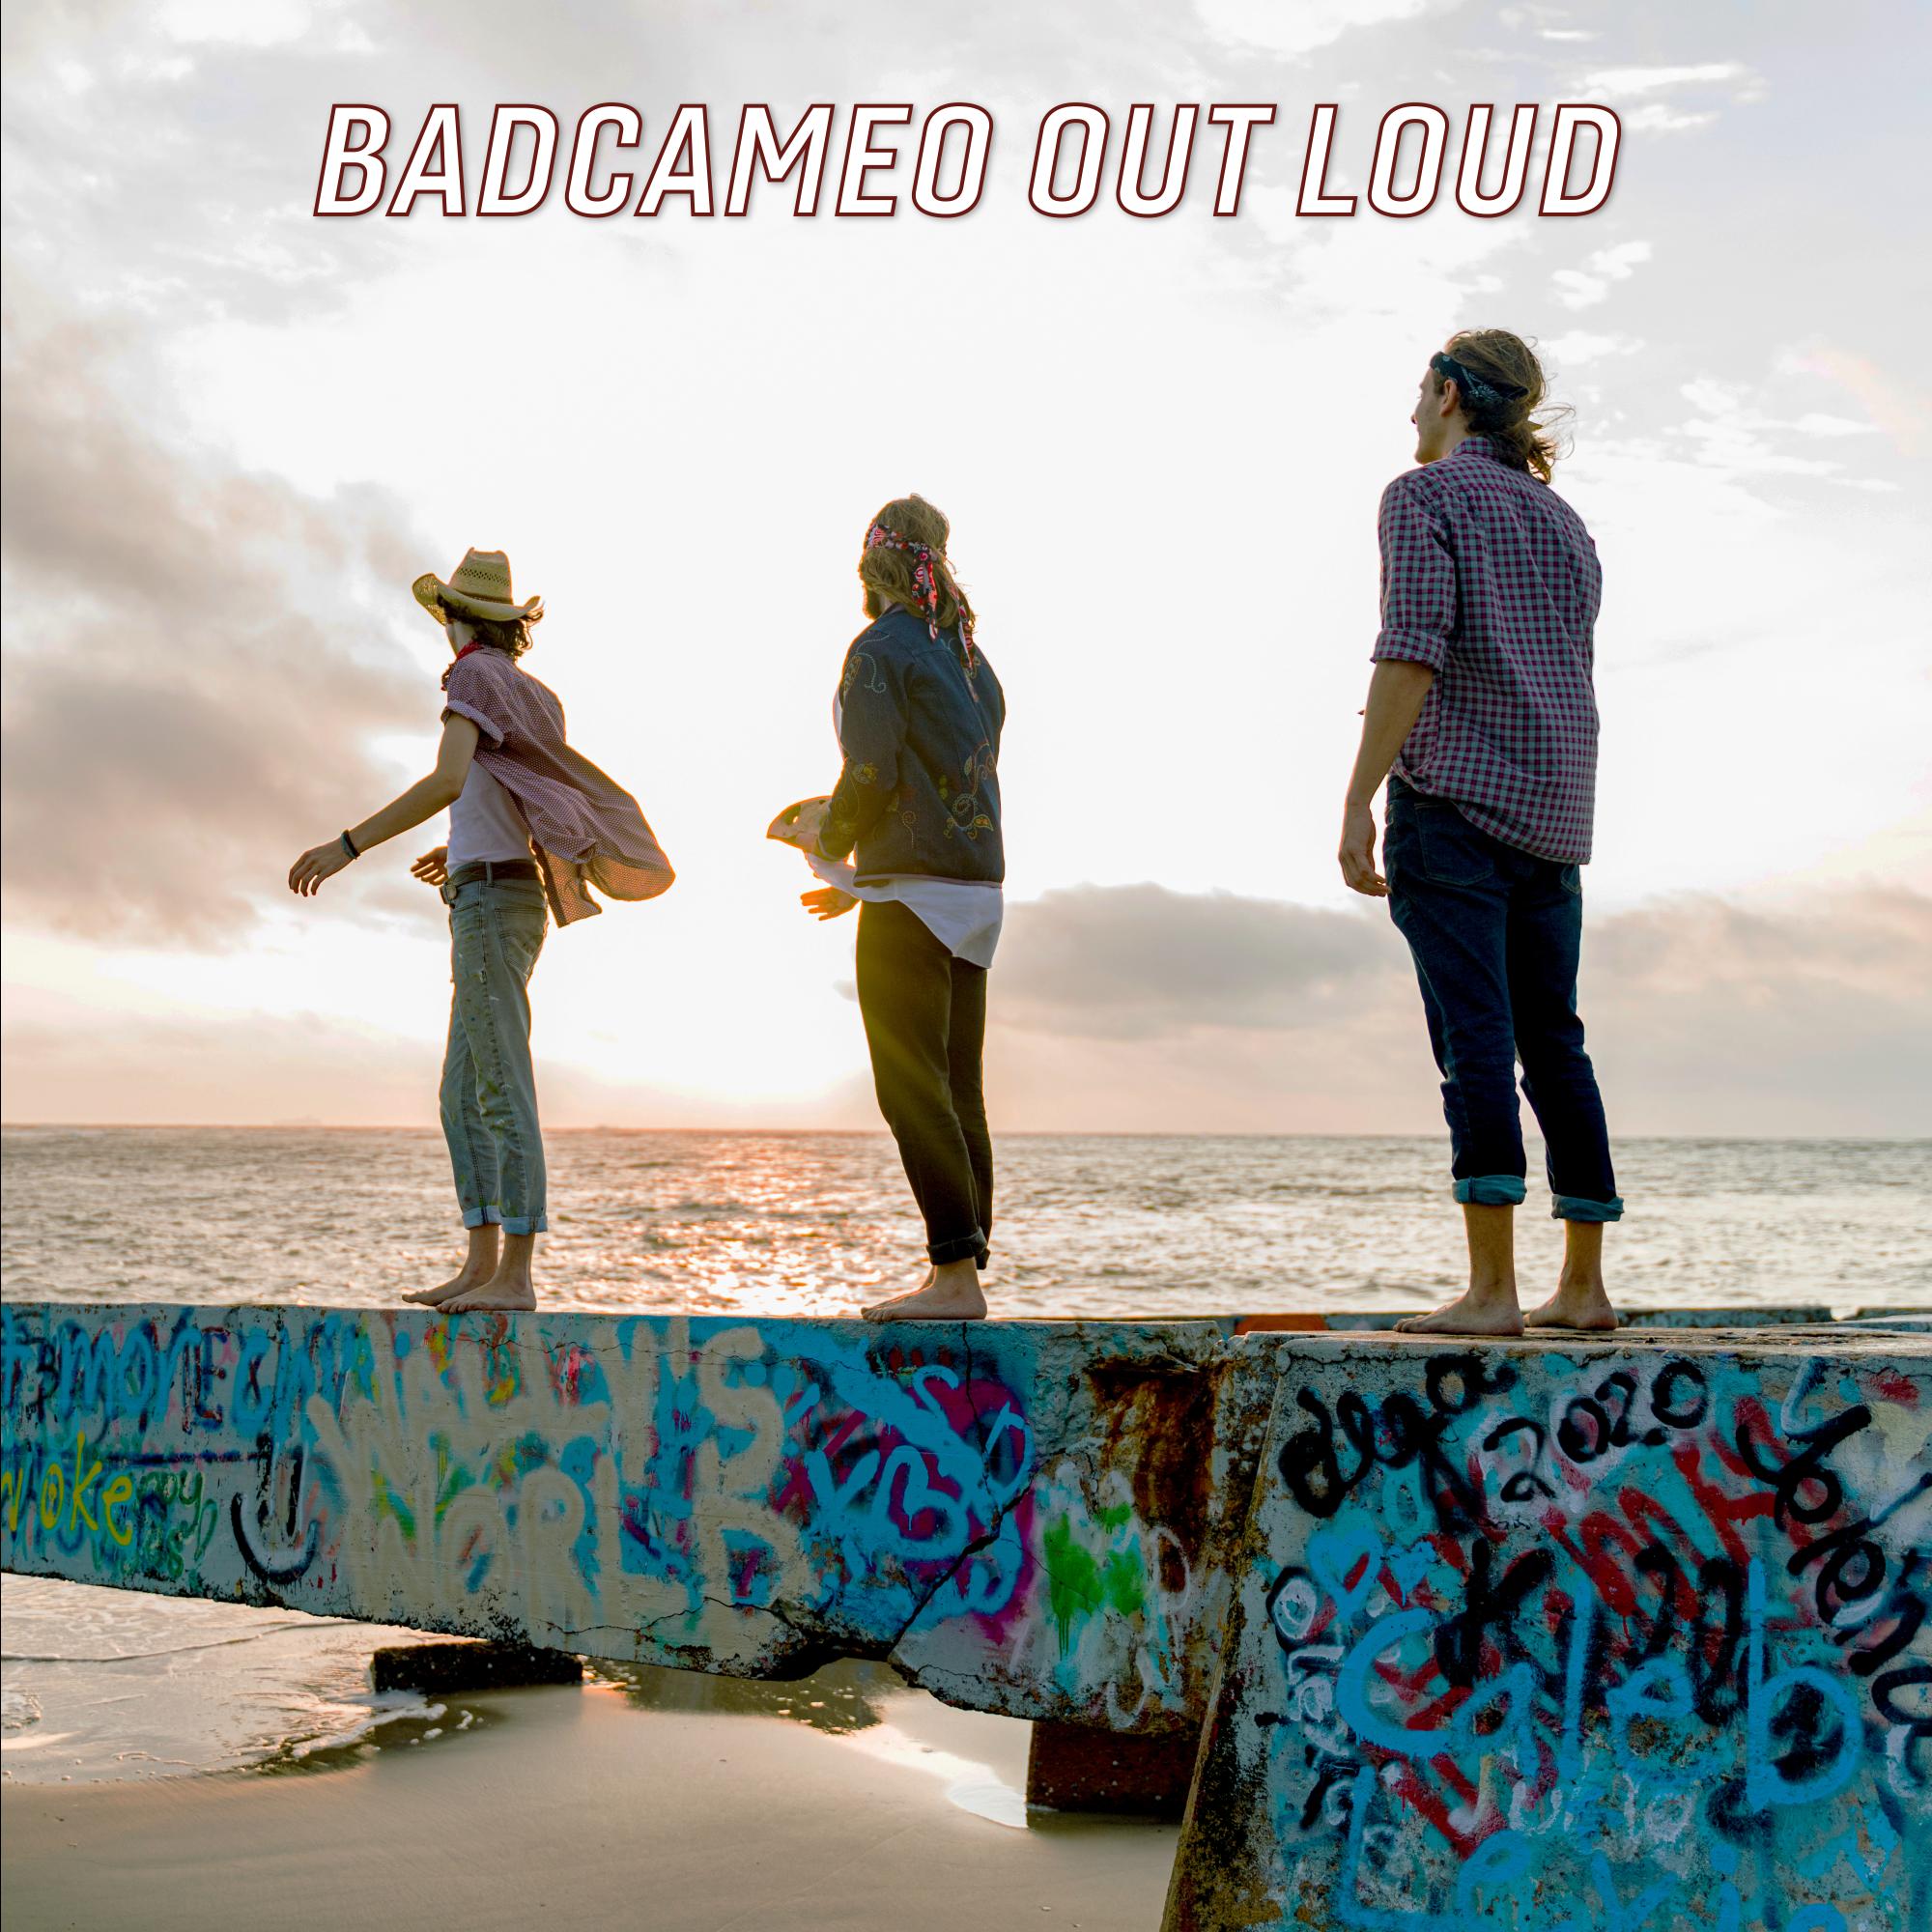 BadCameo Out Loud Image